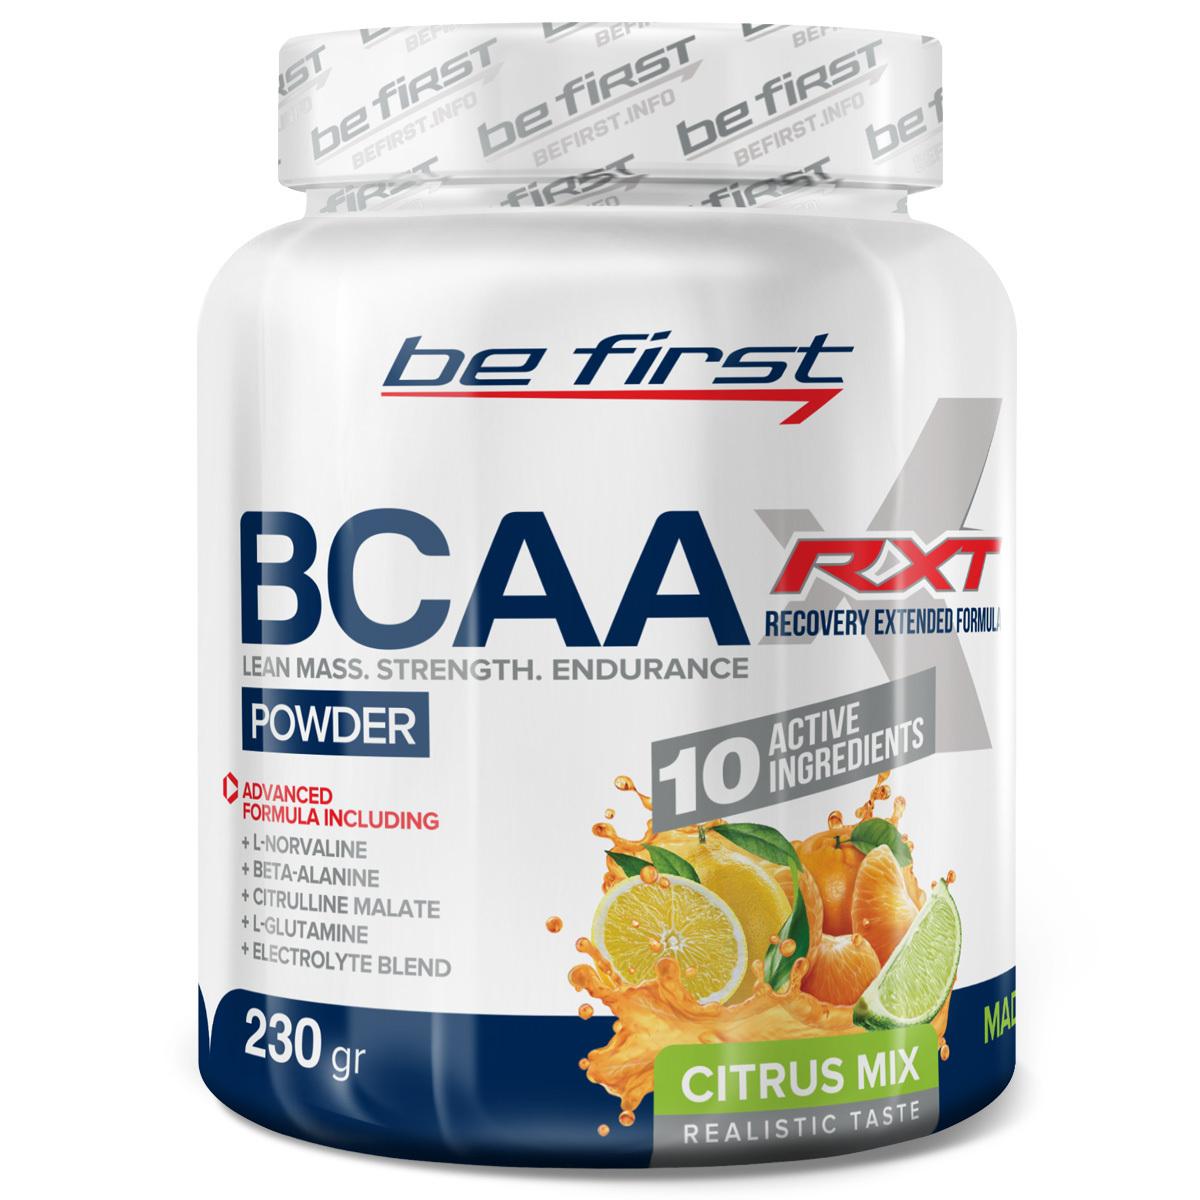 Комплекс аминокислот перед тренировкой BCAA, глютамин, бета-аланин, цитруллин, норвалин, электролиты Be First BCAA RXT 230 гр, цитрусовый микс